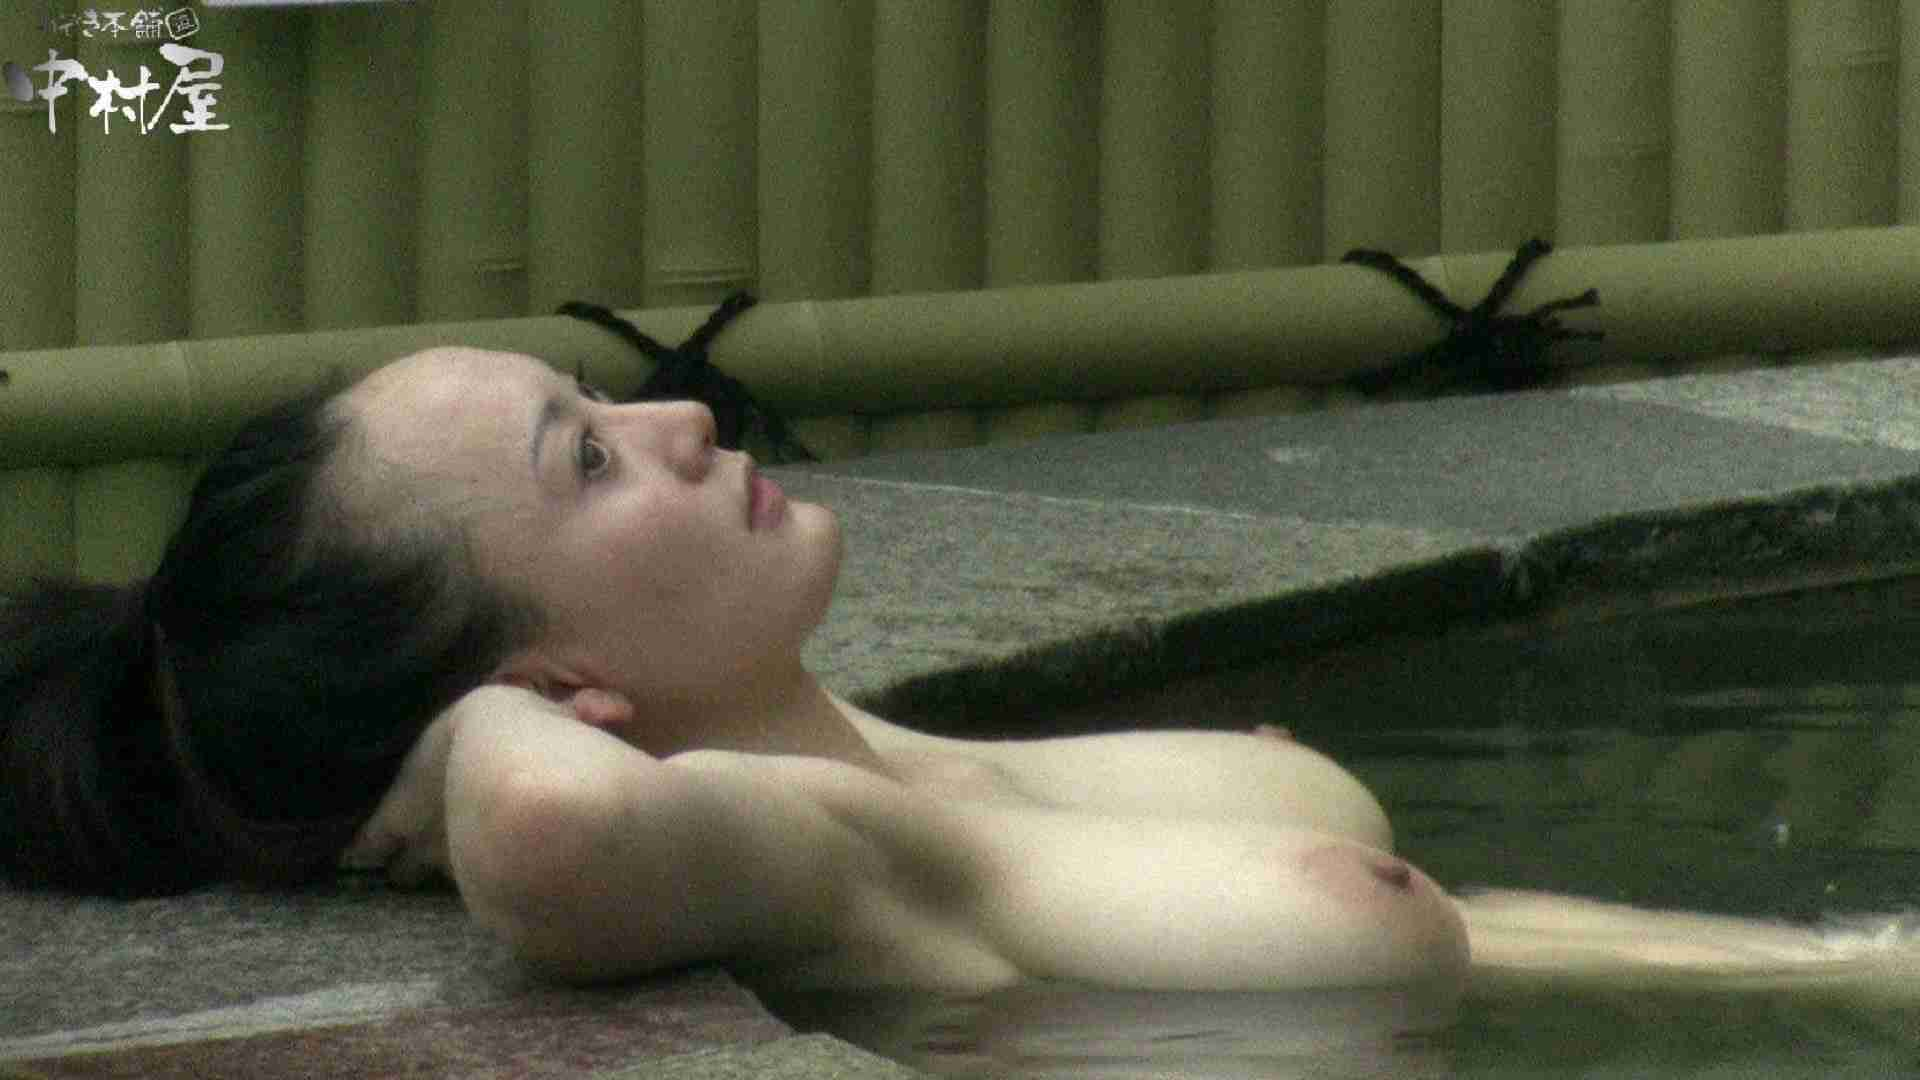 Aquaな露天風呂Vol.900 OLのエロ生活 すけべAV動画紹介 88連発 86